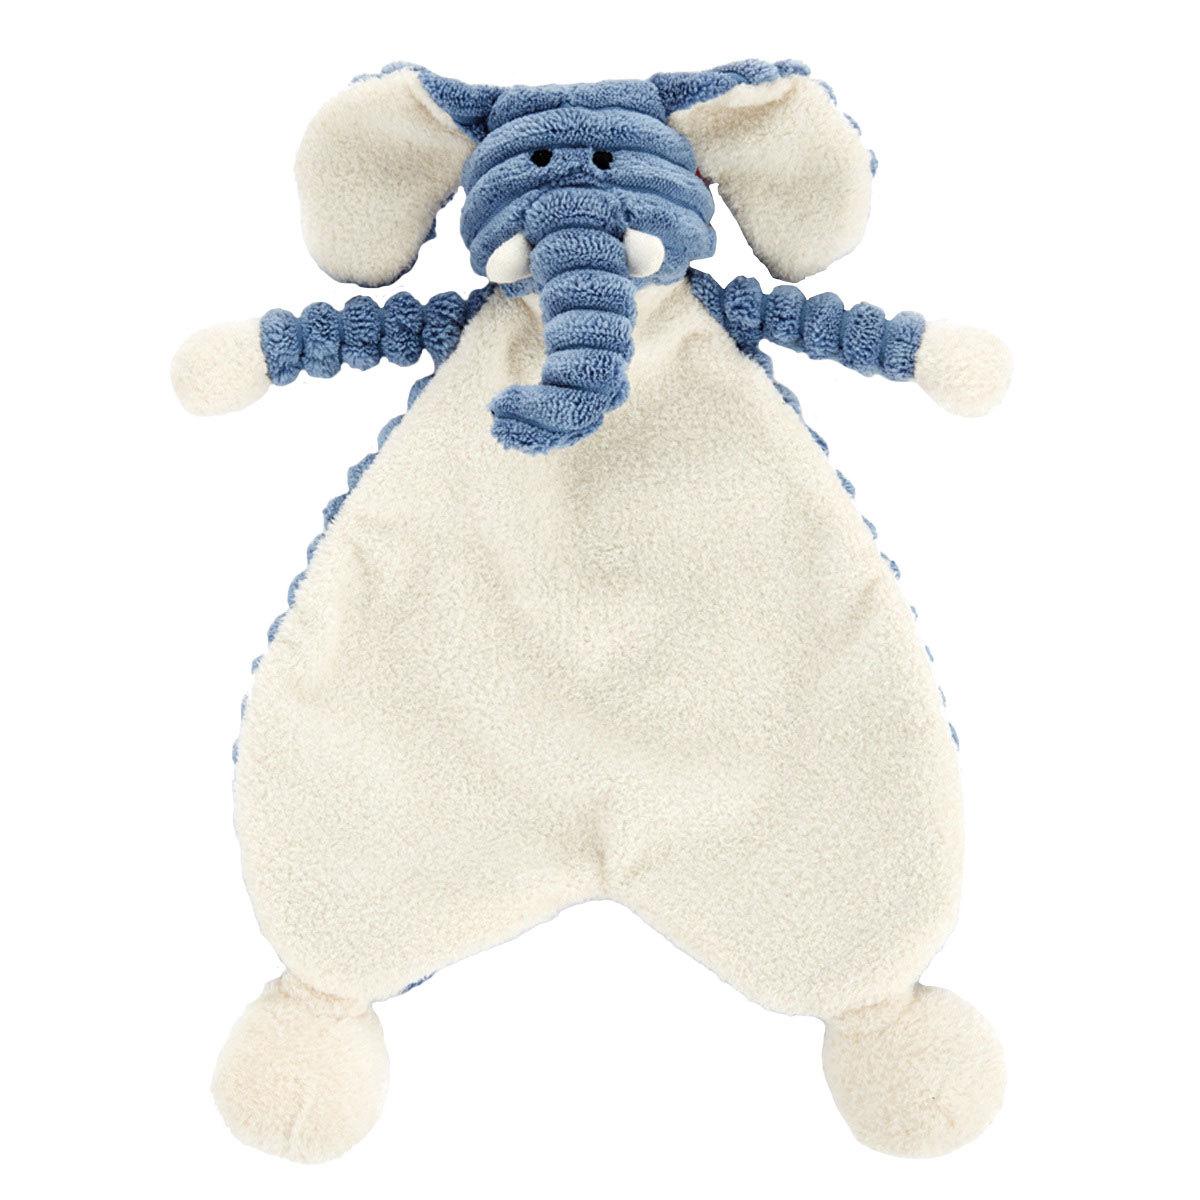 Doudou Cordy Roy Baby Eléphant Soother Doudou Eléphant